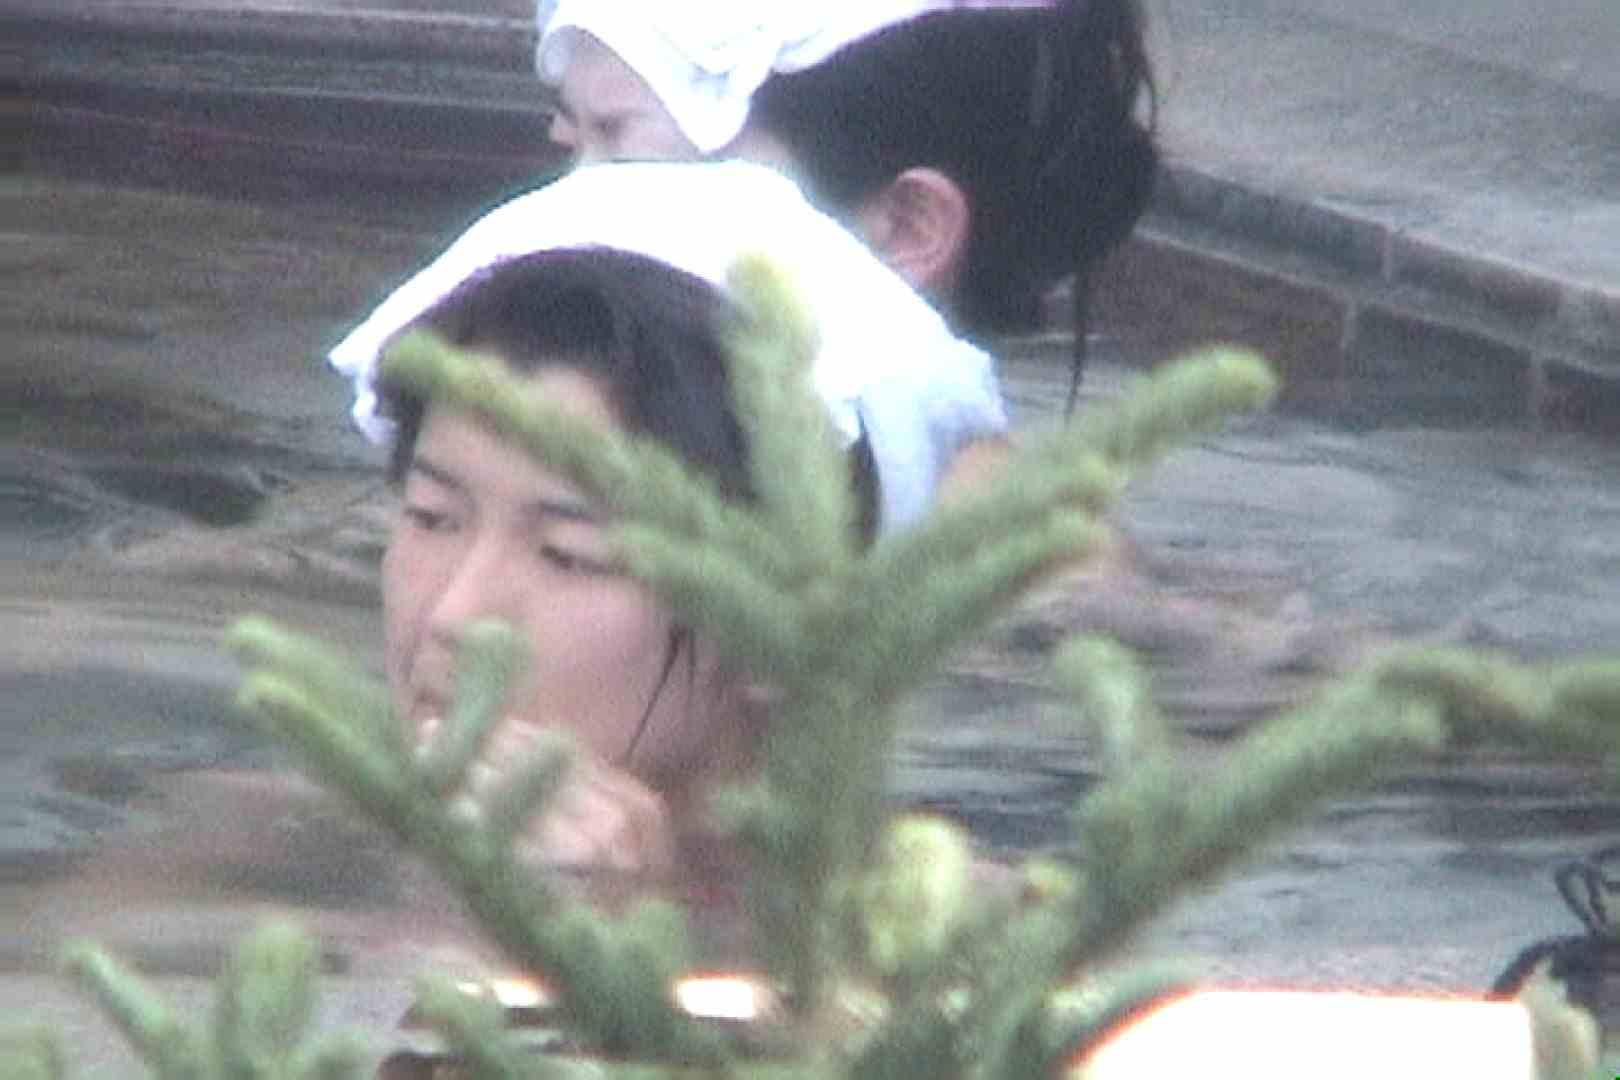 Aquaな露天風呂Vol.80【VIP限定】 露天風呂編  76PIX 66